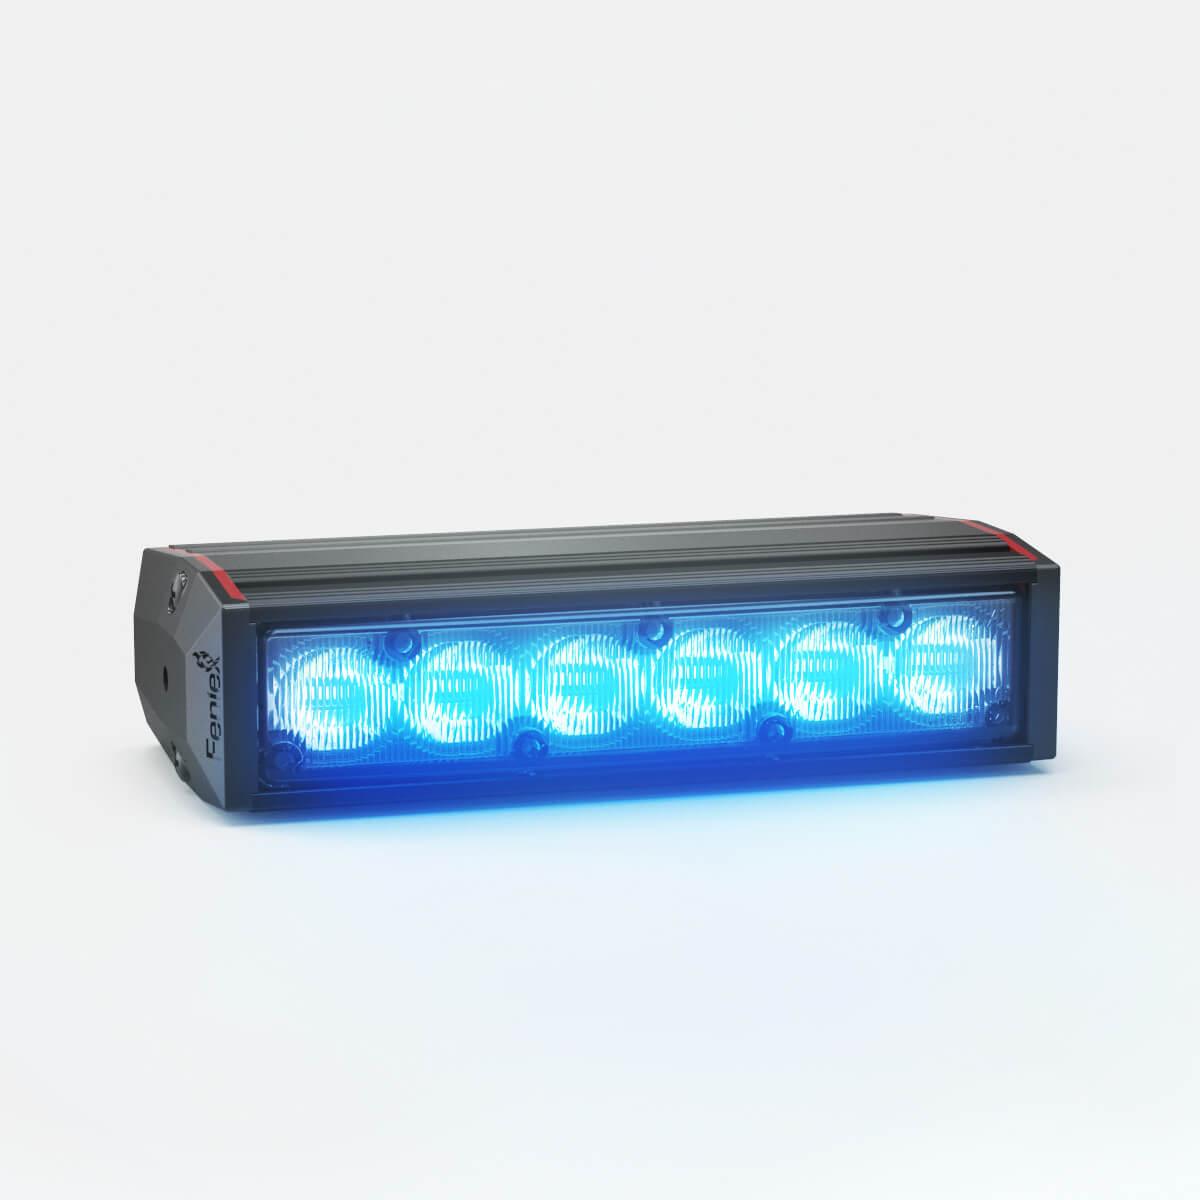 Fusion 100 Lightstick